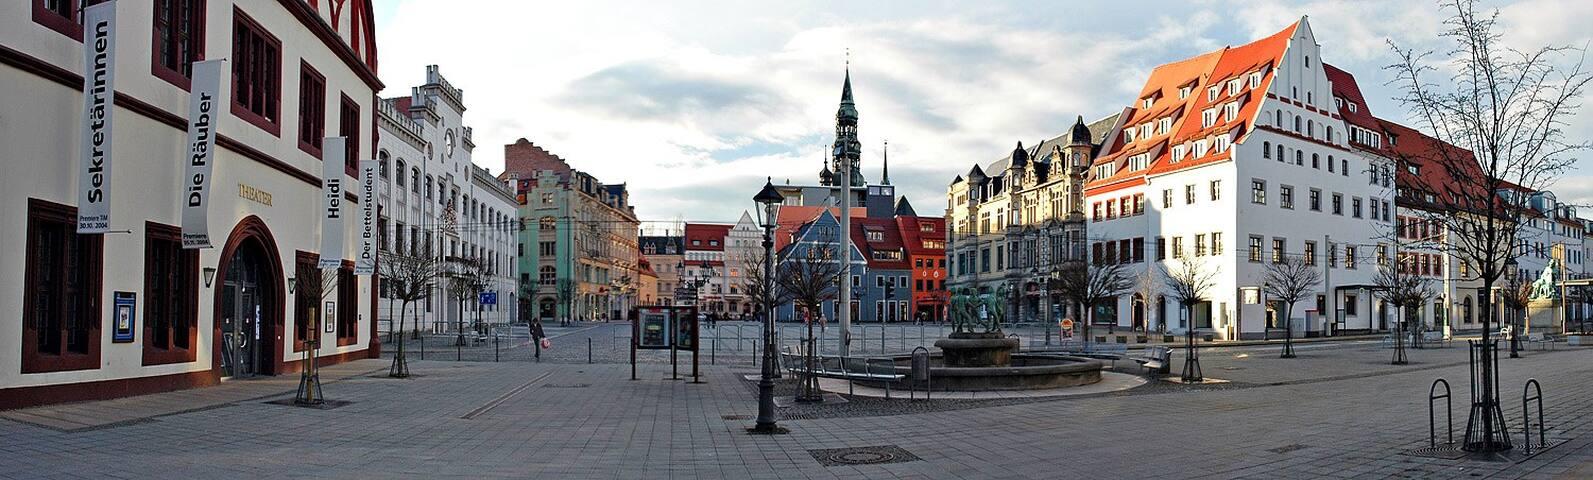 City Pension Zwickau FW